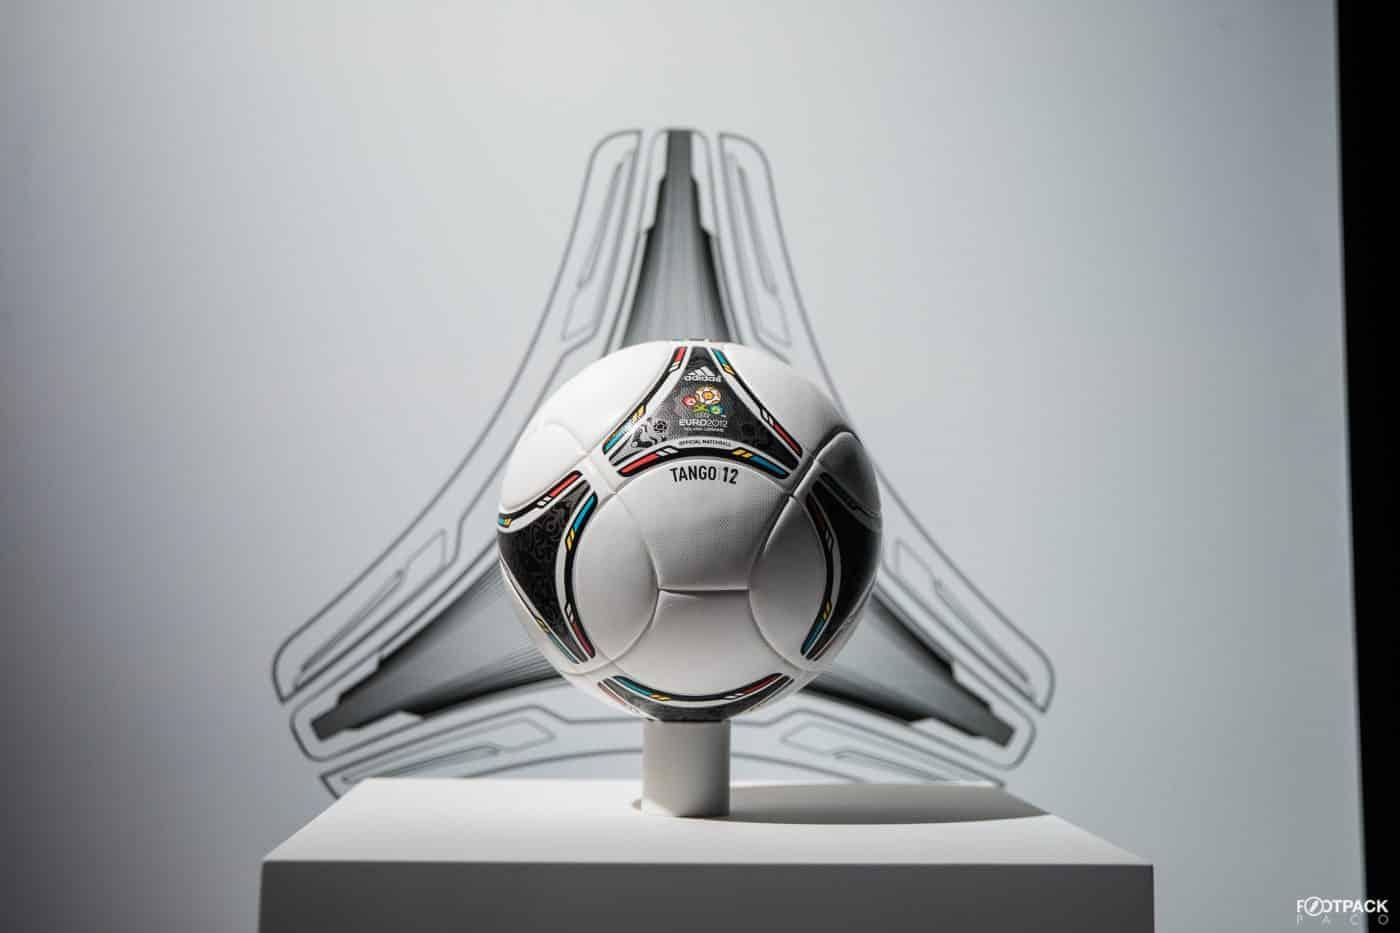 ballon-football-adidas-euro-2012-footpack-2019-2